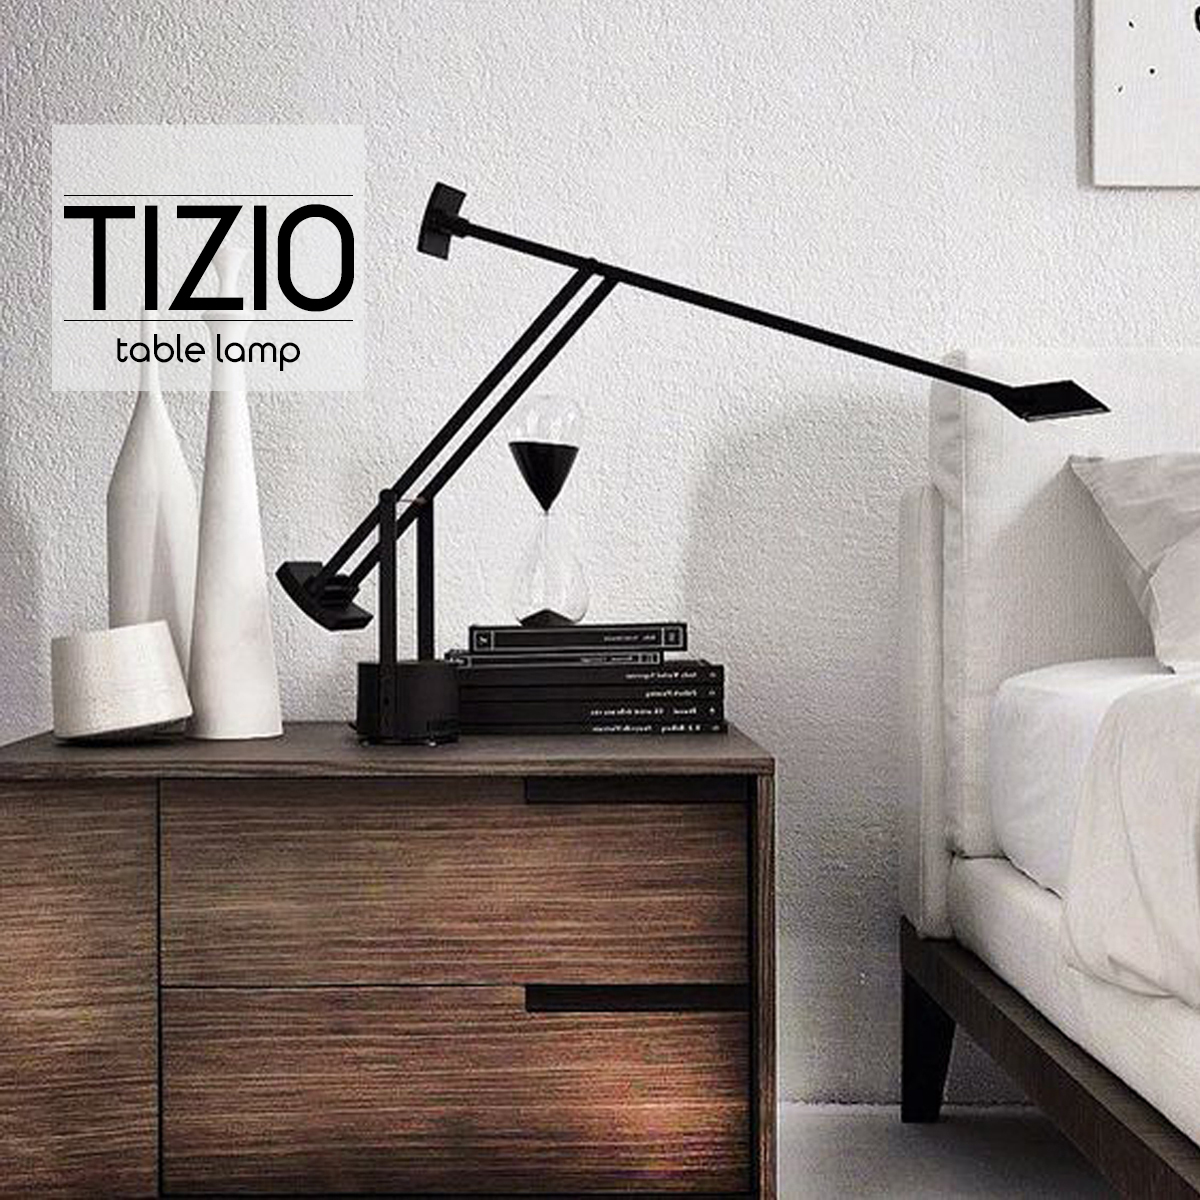 TIZIO ティチオ Richard Sapper リチャード・サパー デスクライト スタンドライト LED デザイナーズ照明 間接 読書灯 照明